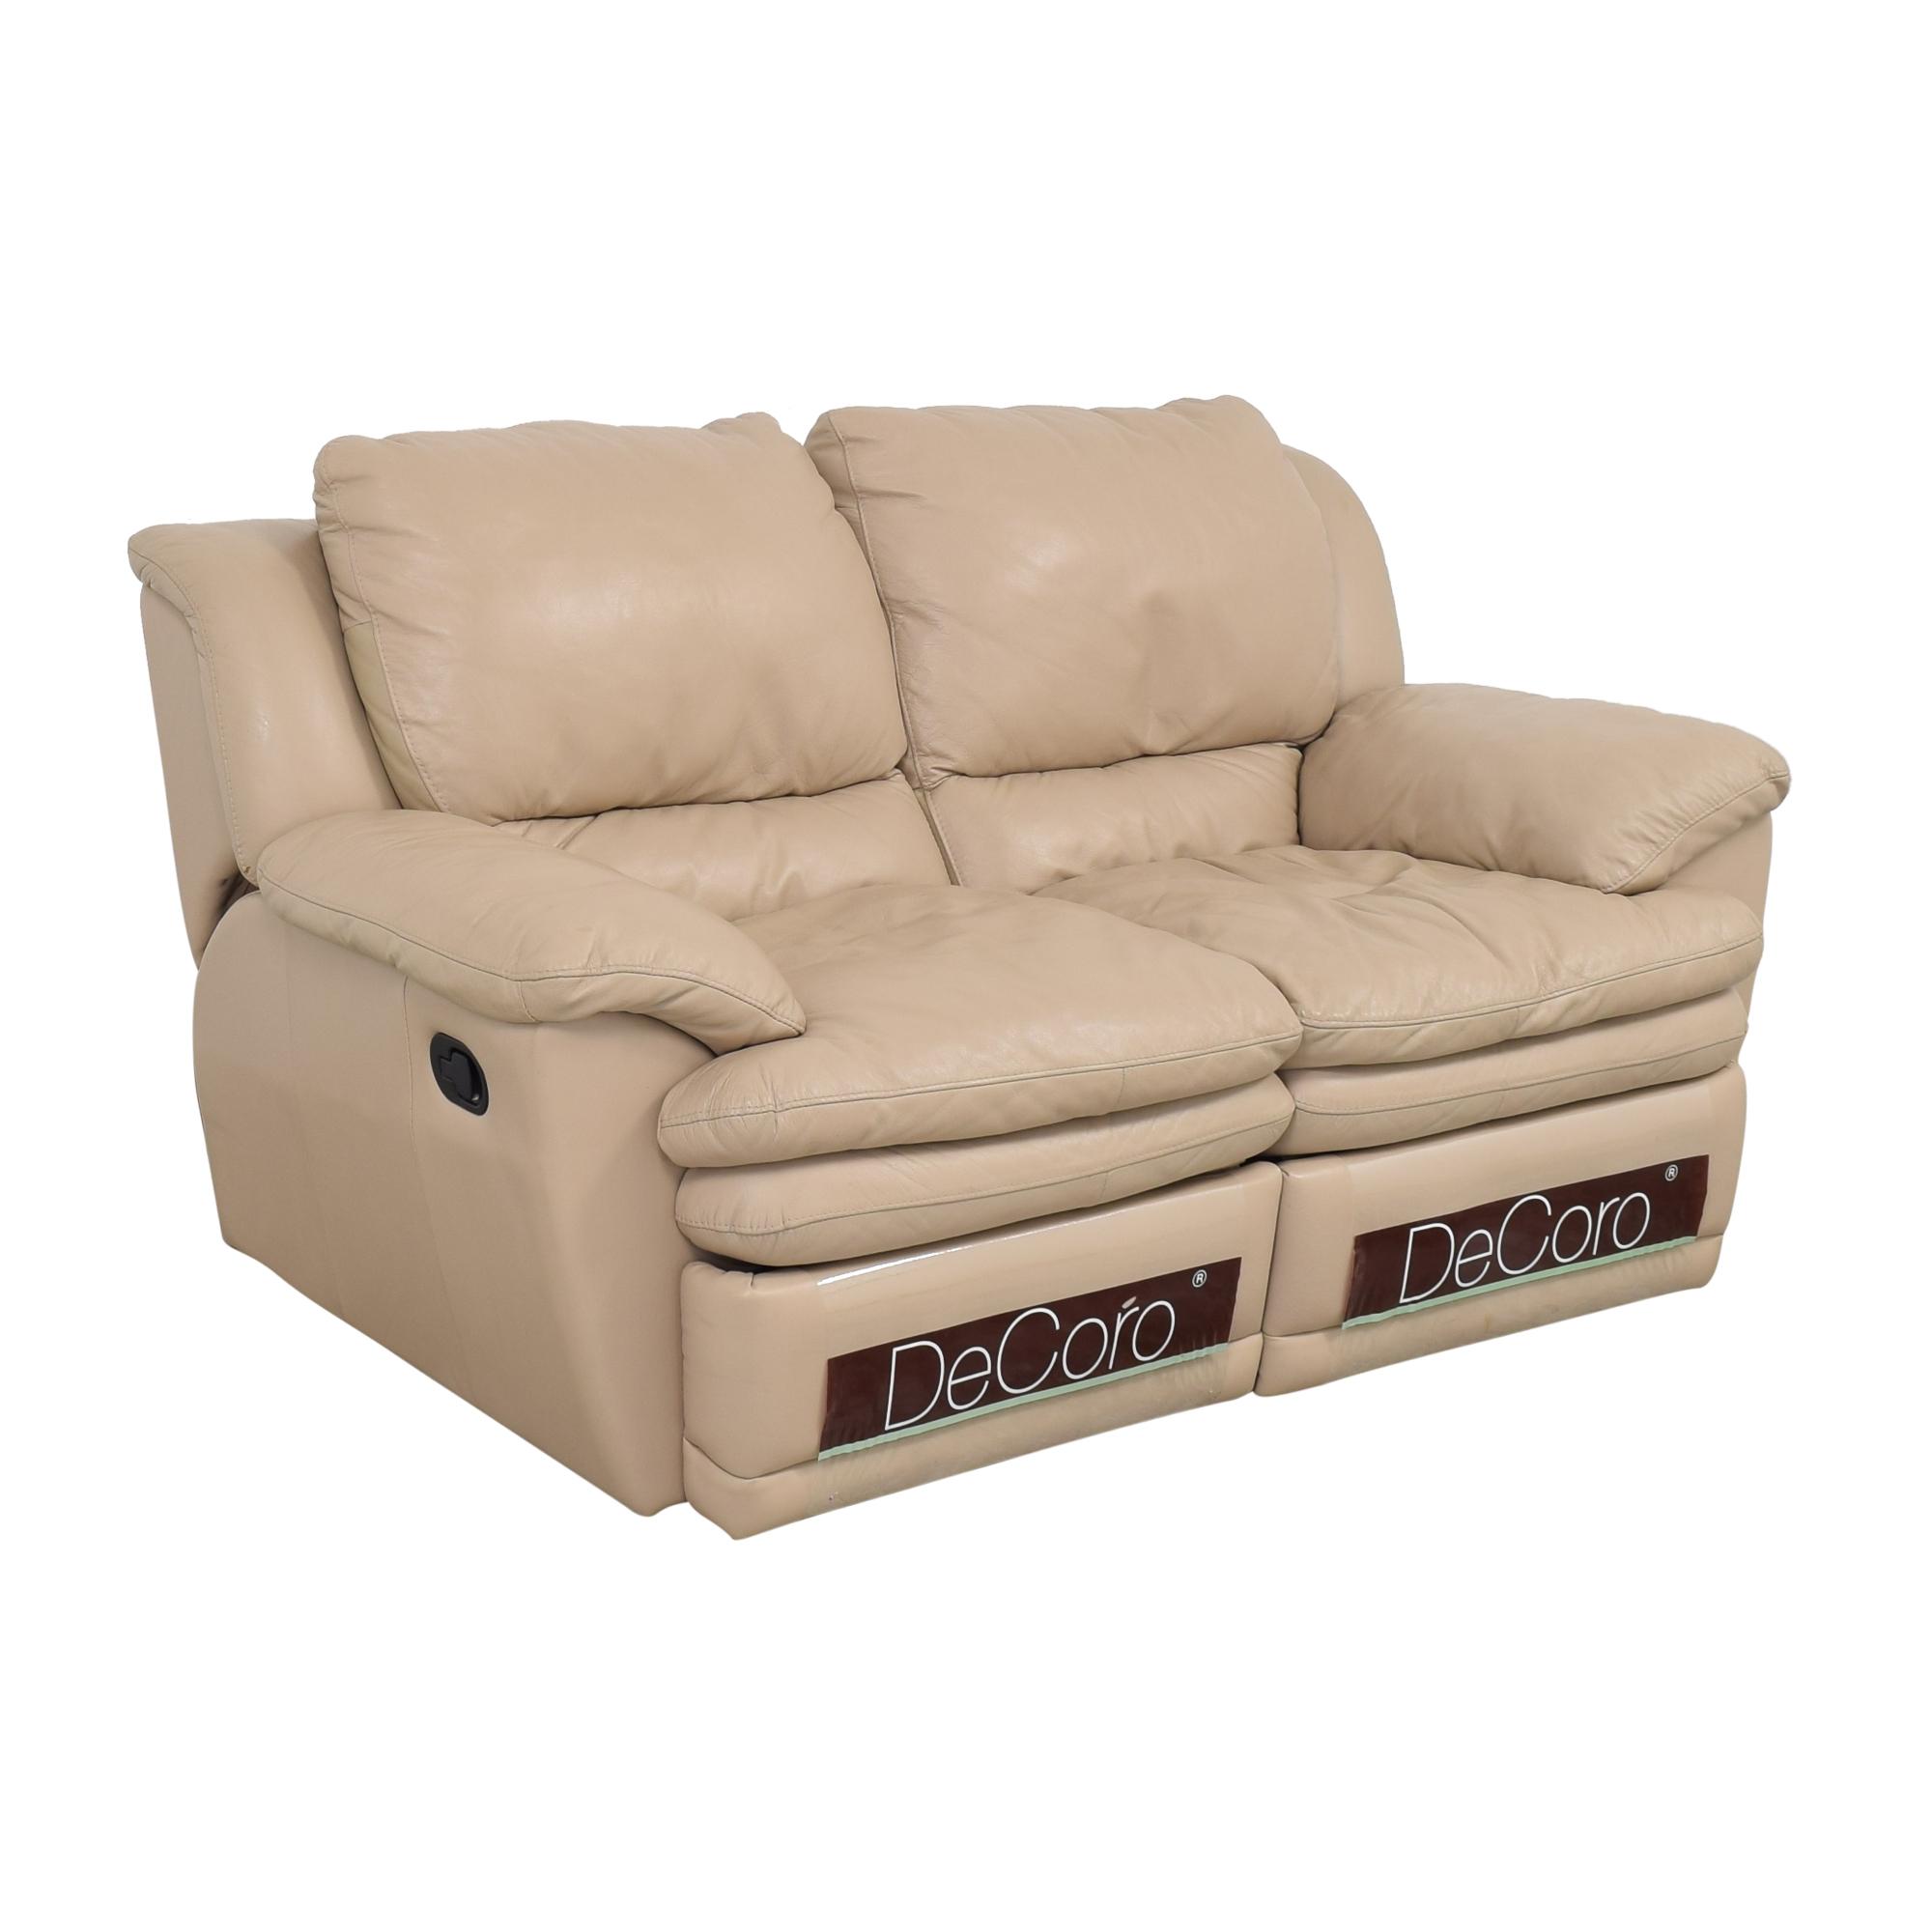 buy DeCoro Reclining Loveseat DeCoro Sofas